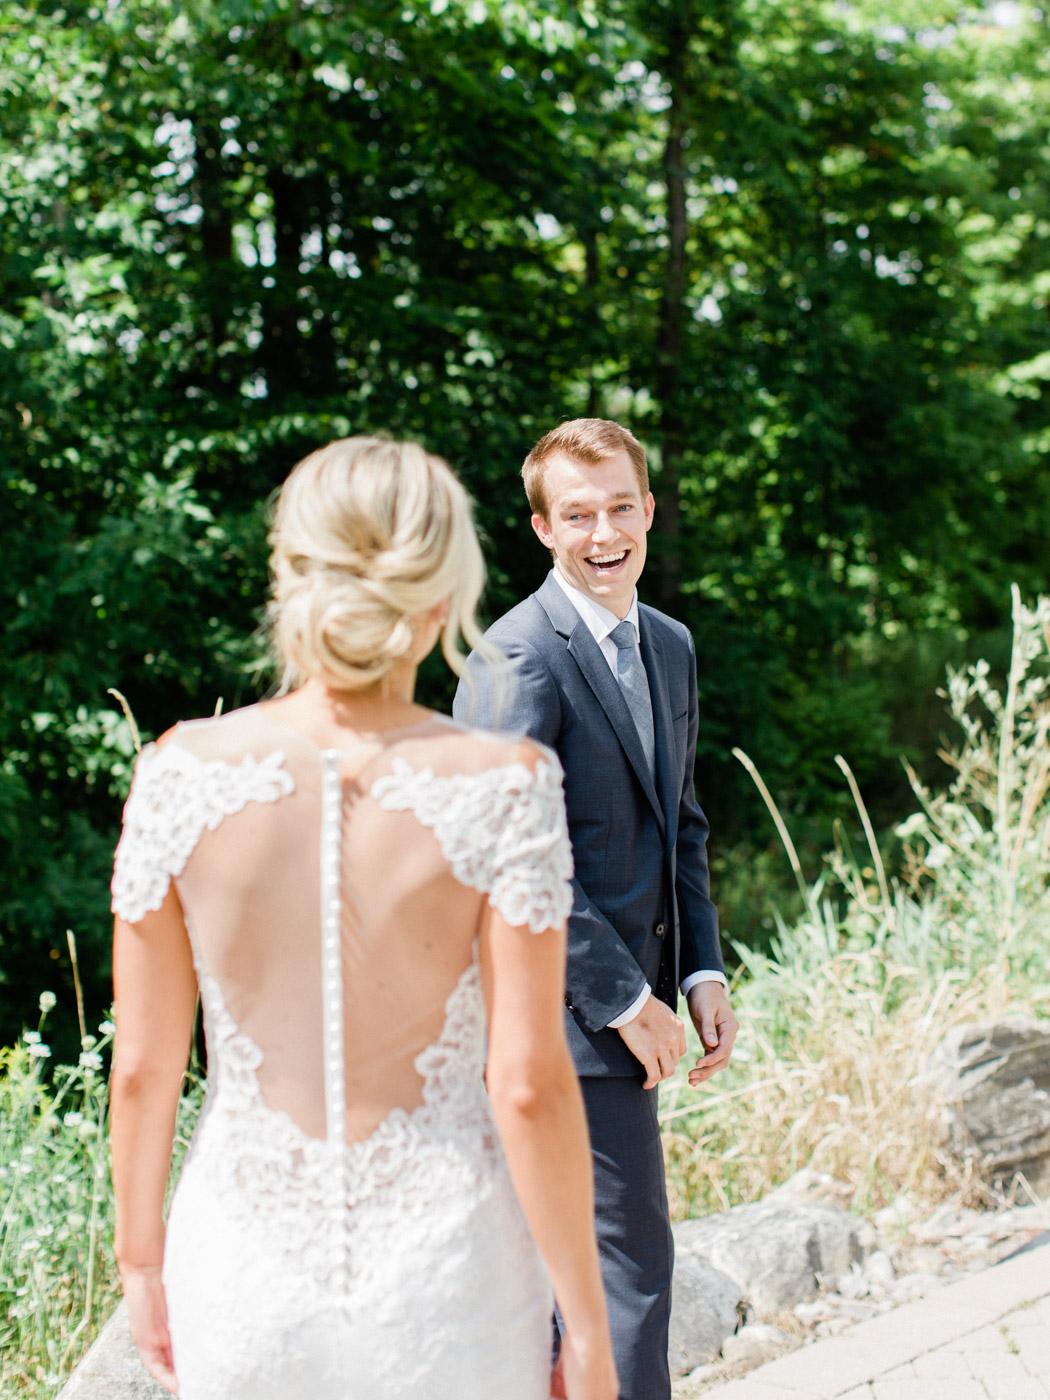 Toronto-Muskoka-wedding-photographer-summery-fun-documentary-the-marriott-rosseau32.jpg